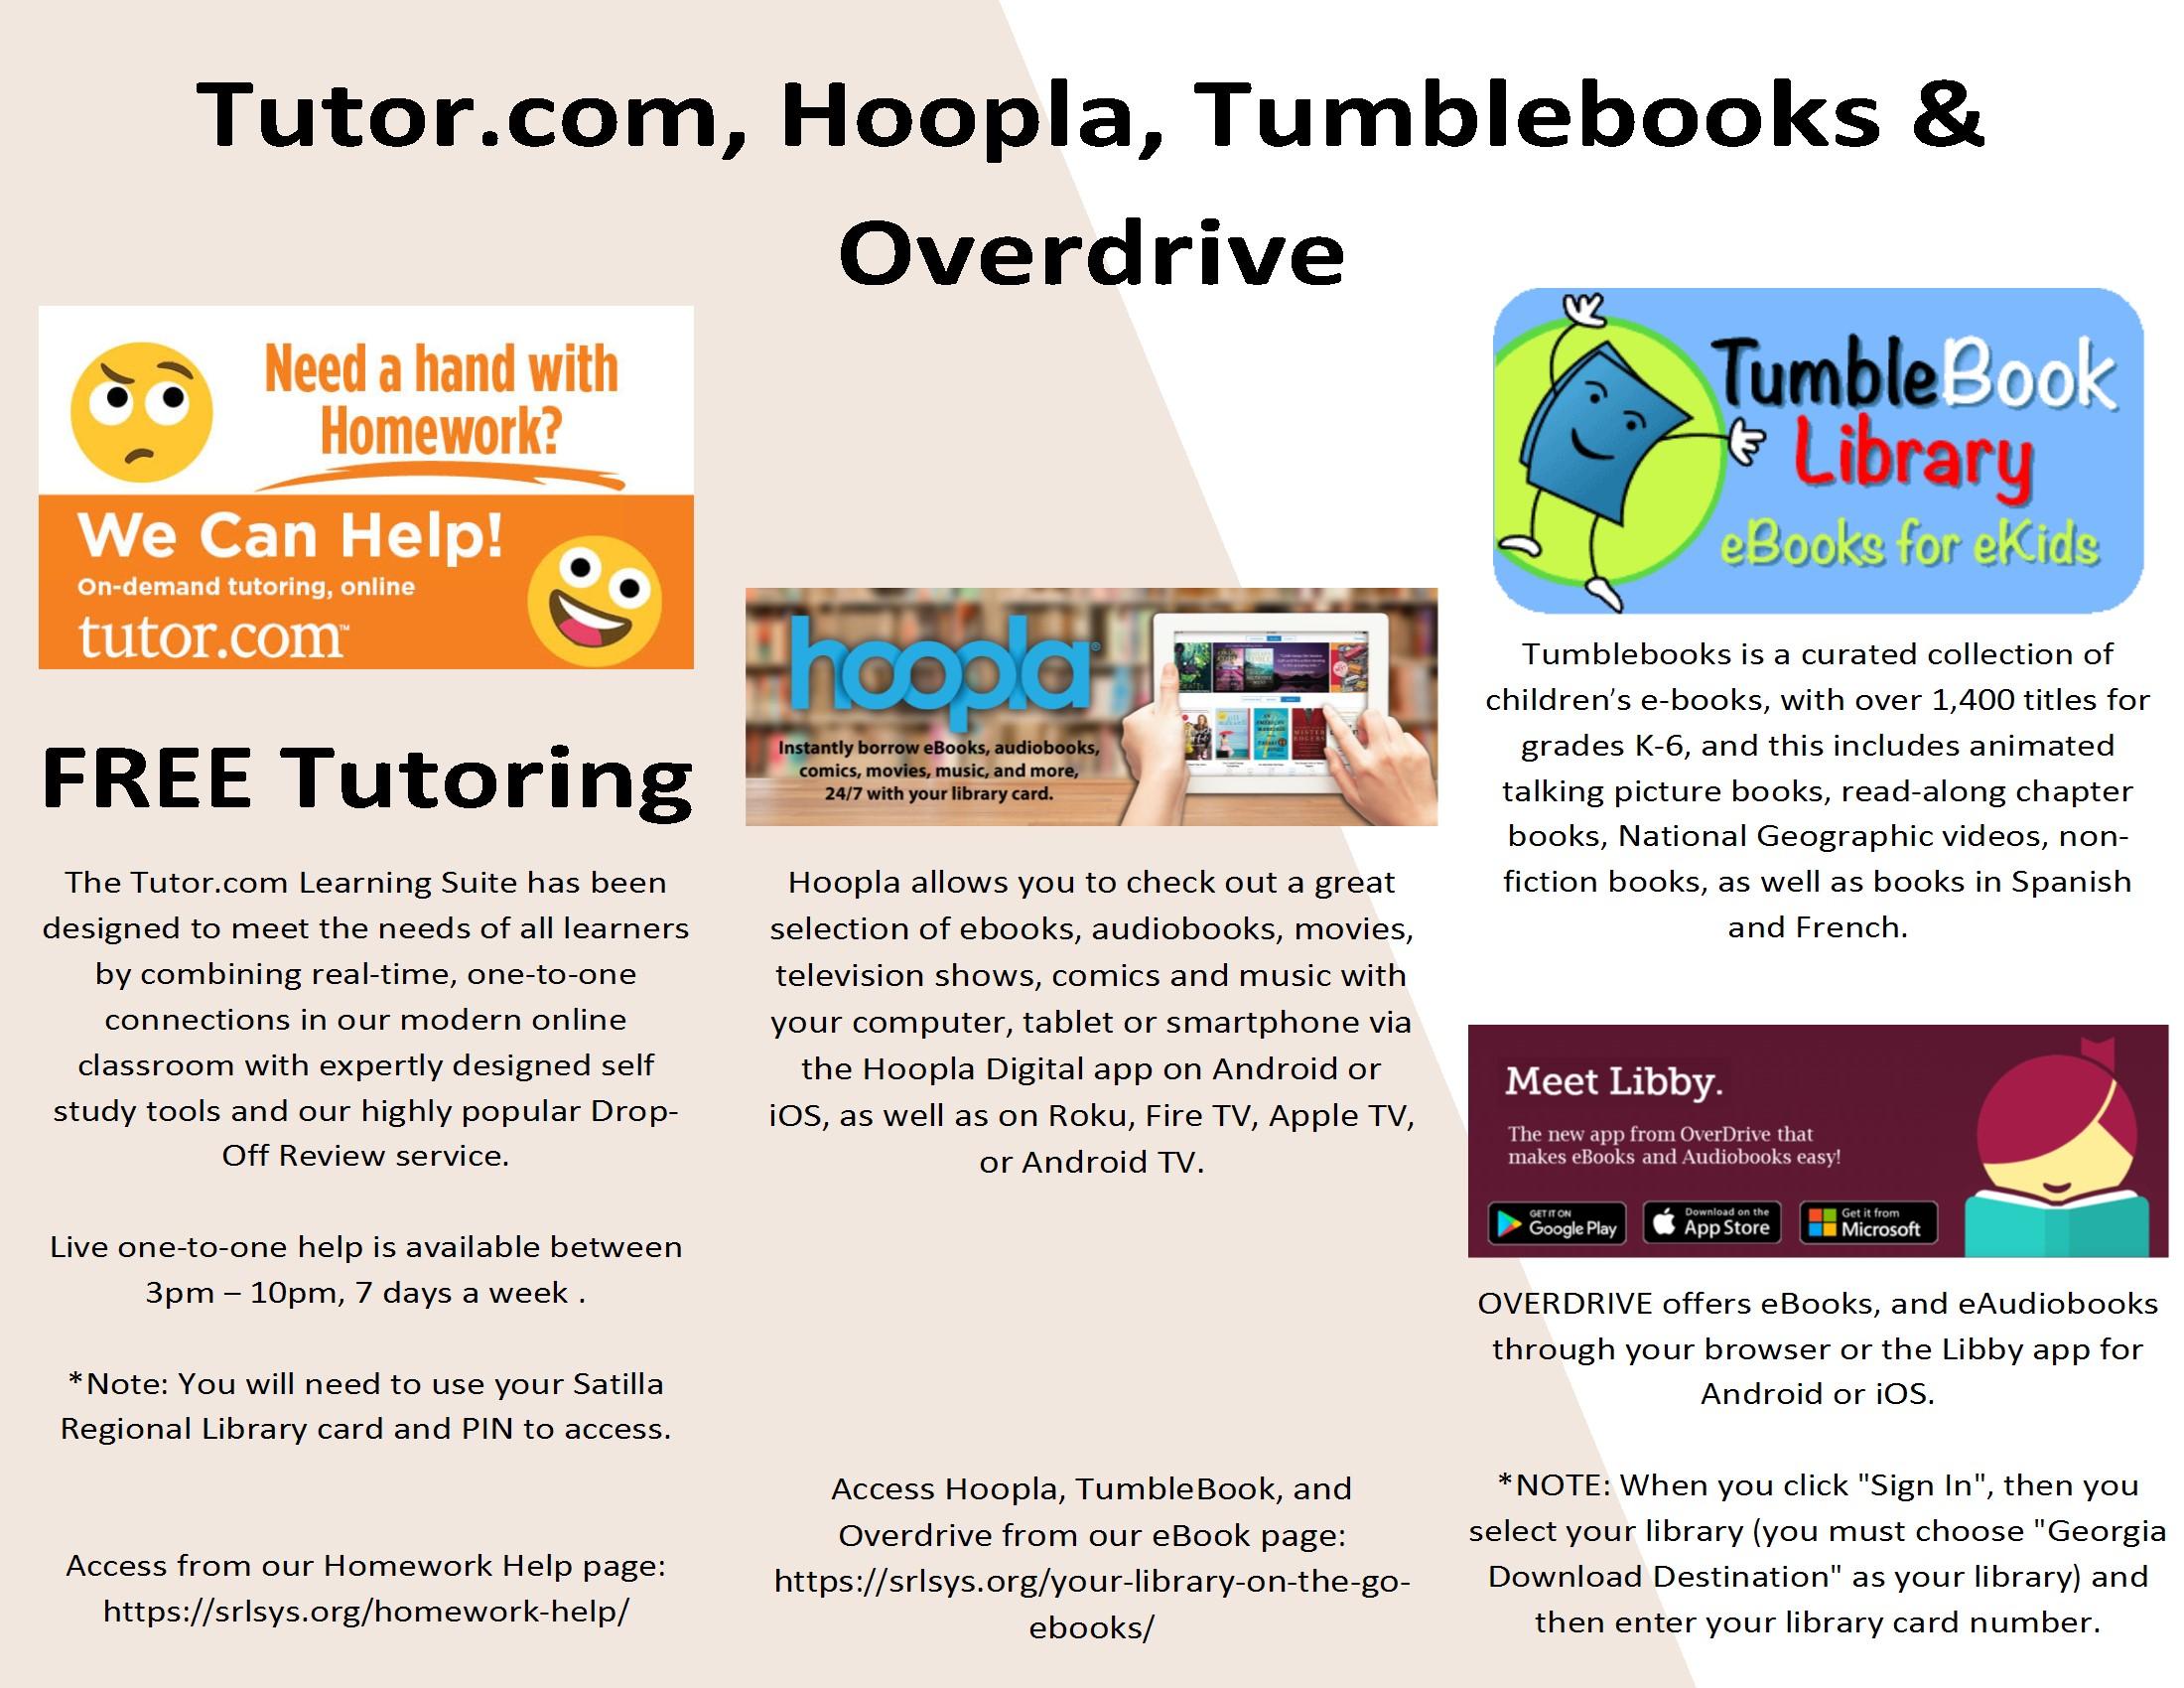 Tutor.com Services with Satilla Regional Library Card